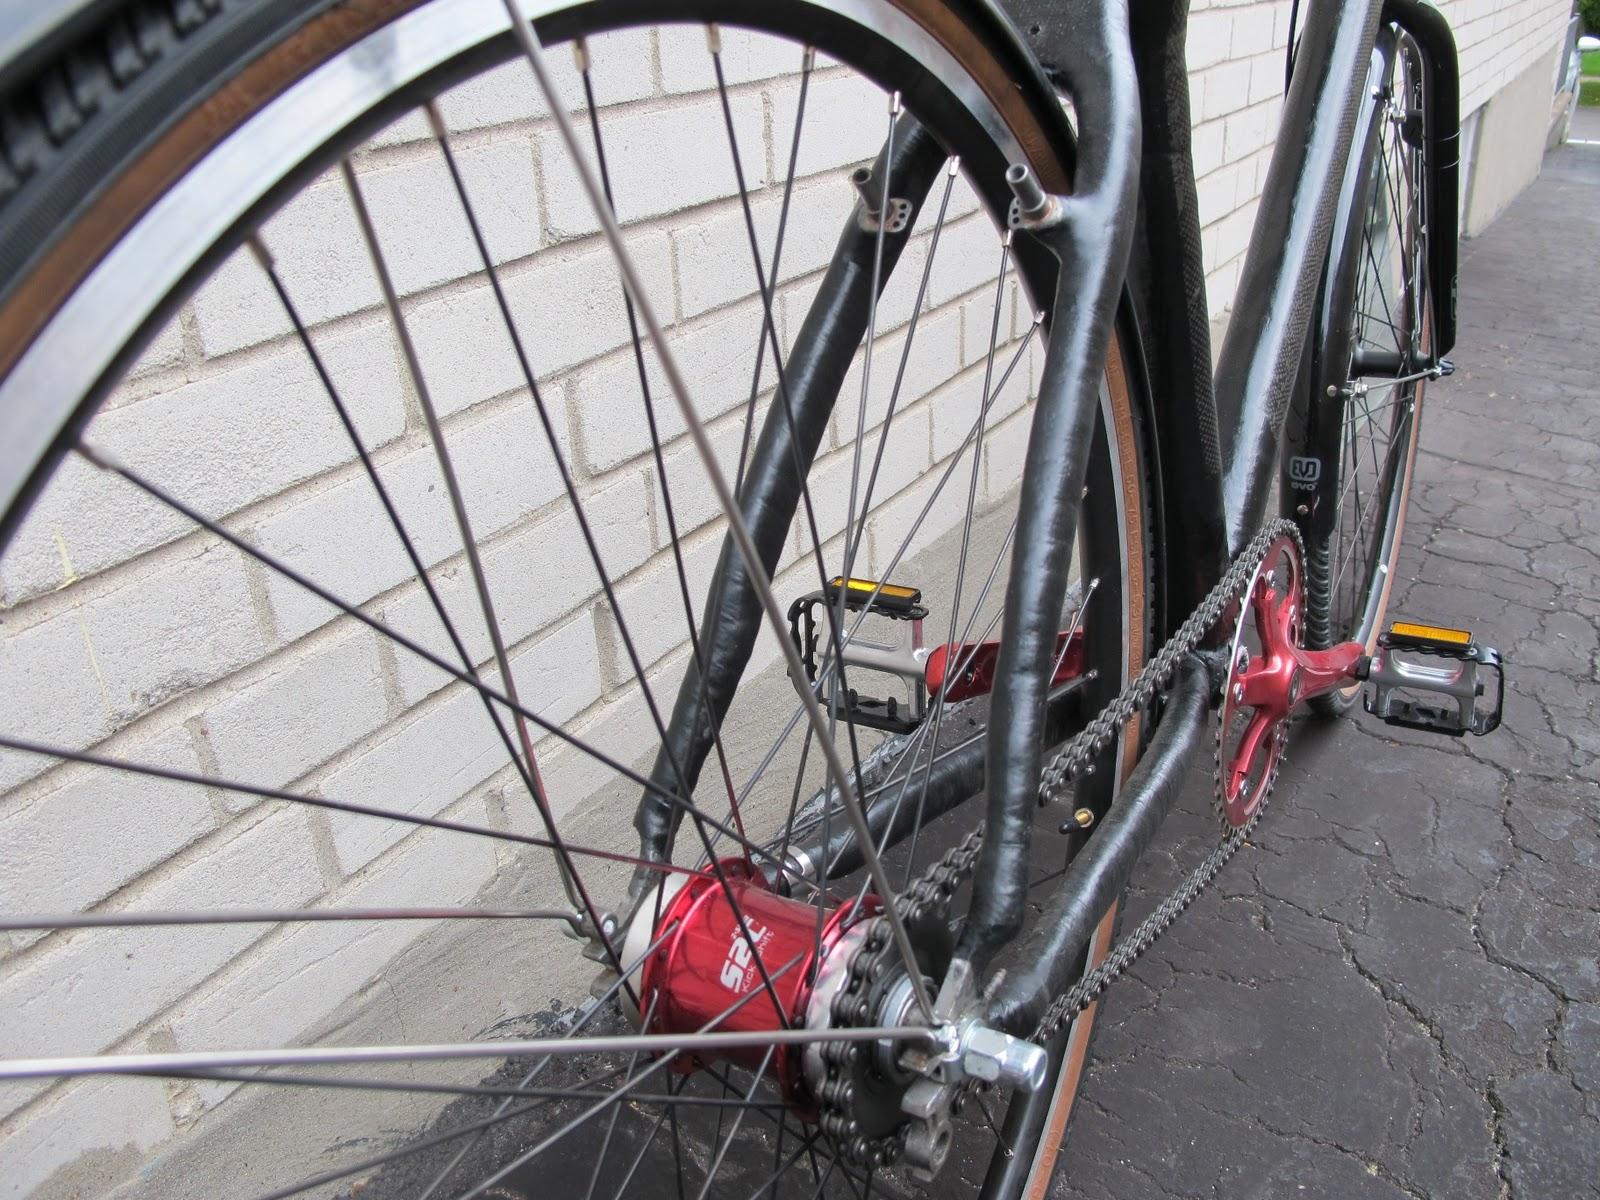 brano mères bamboo bikes